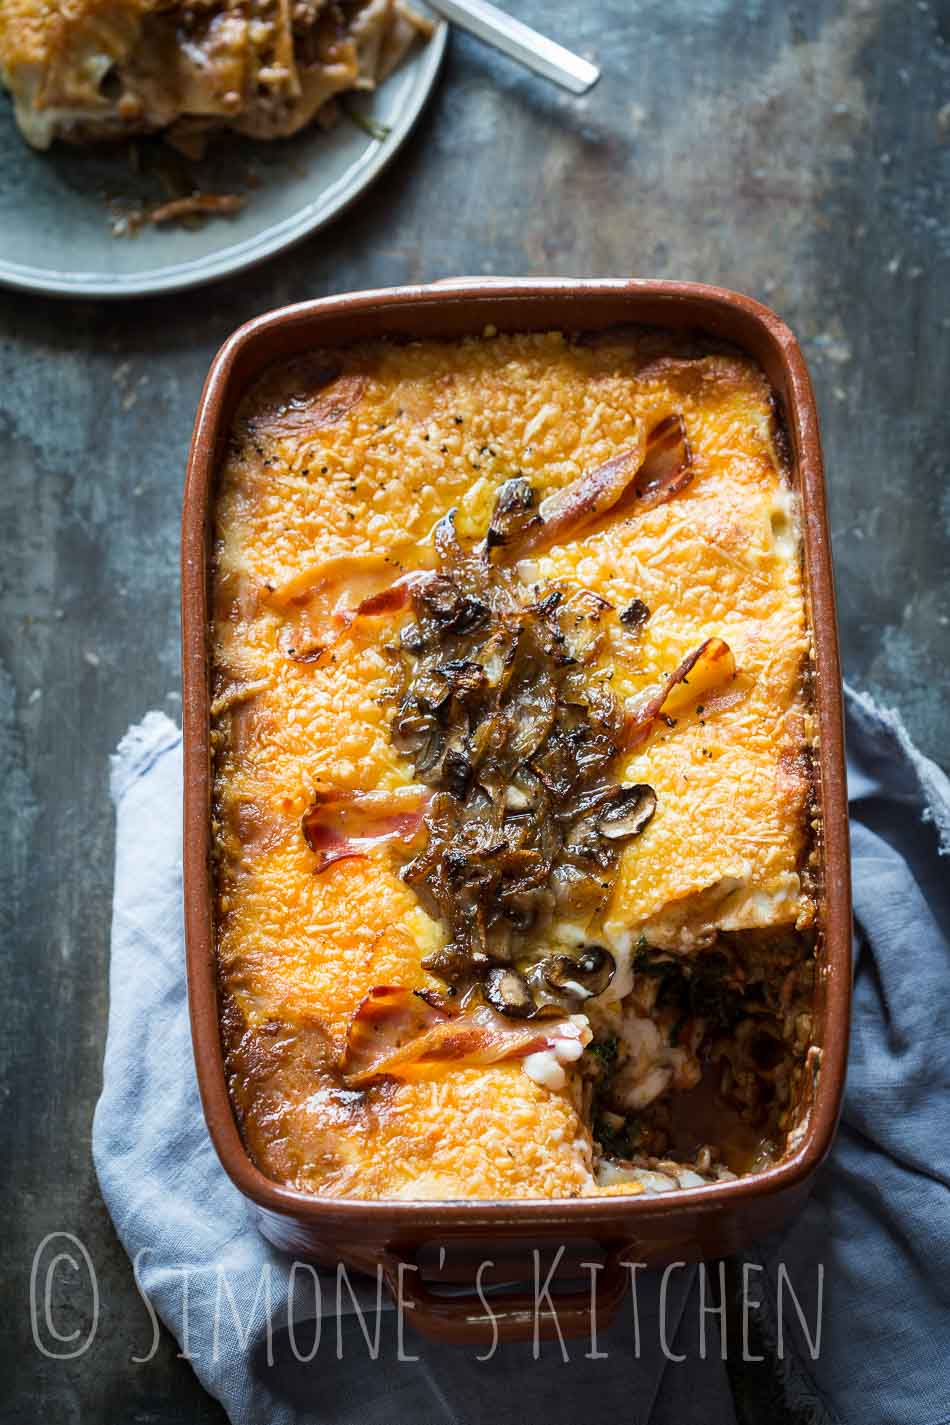 Lekkerste lasagna   simoneskitchen.nl